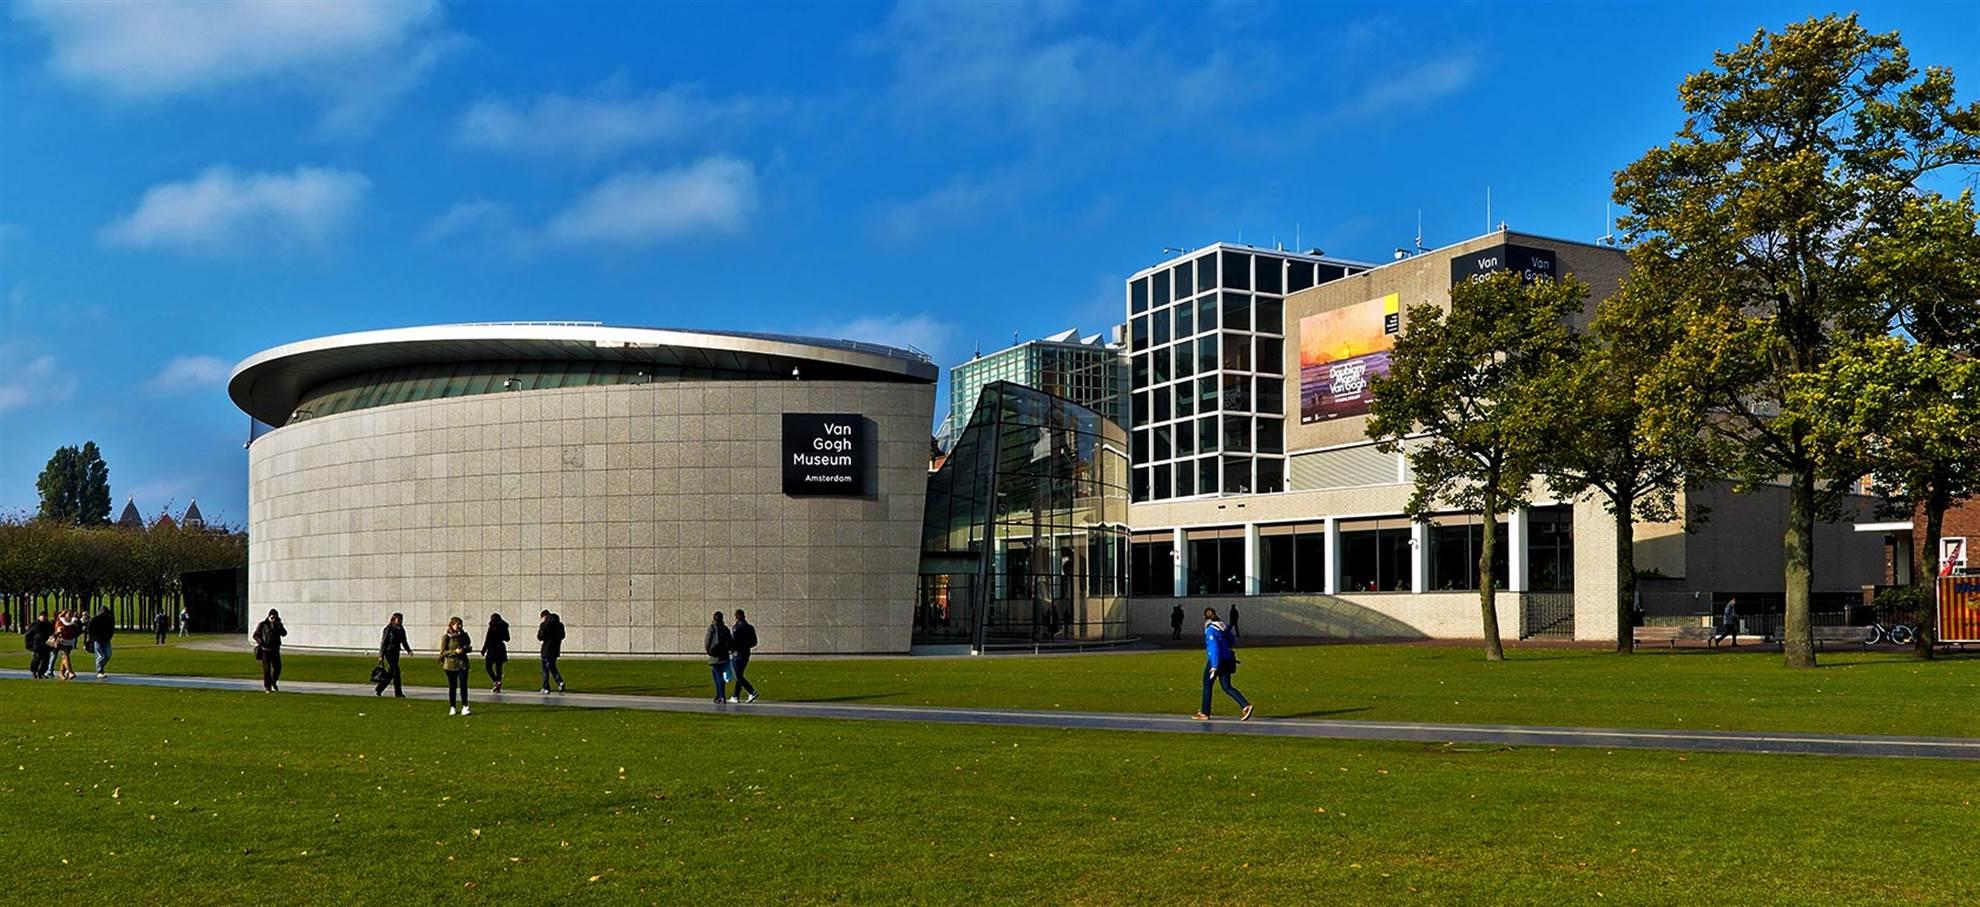 Van Gogh Museum + ljudguide